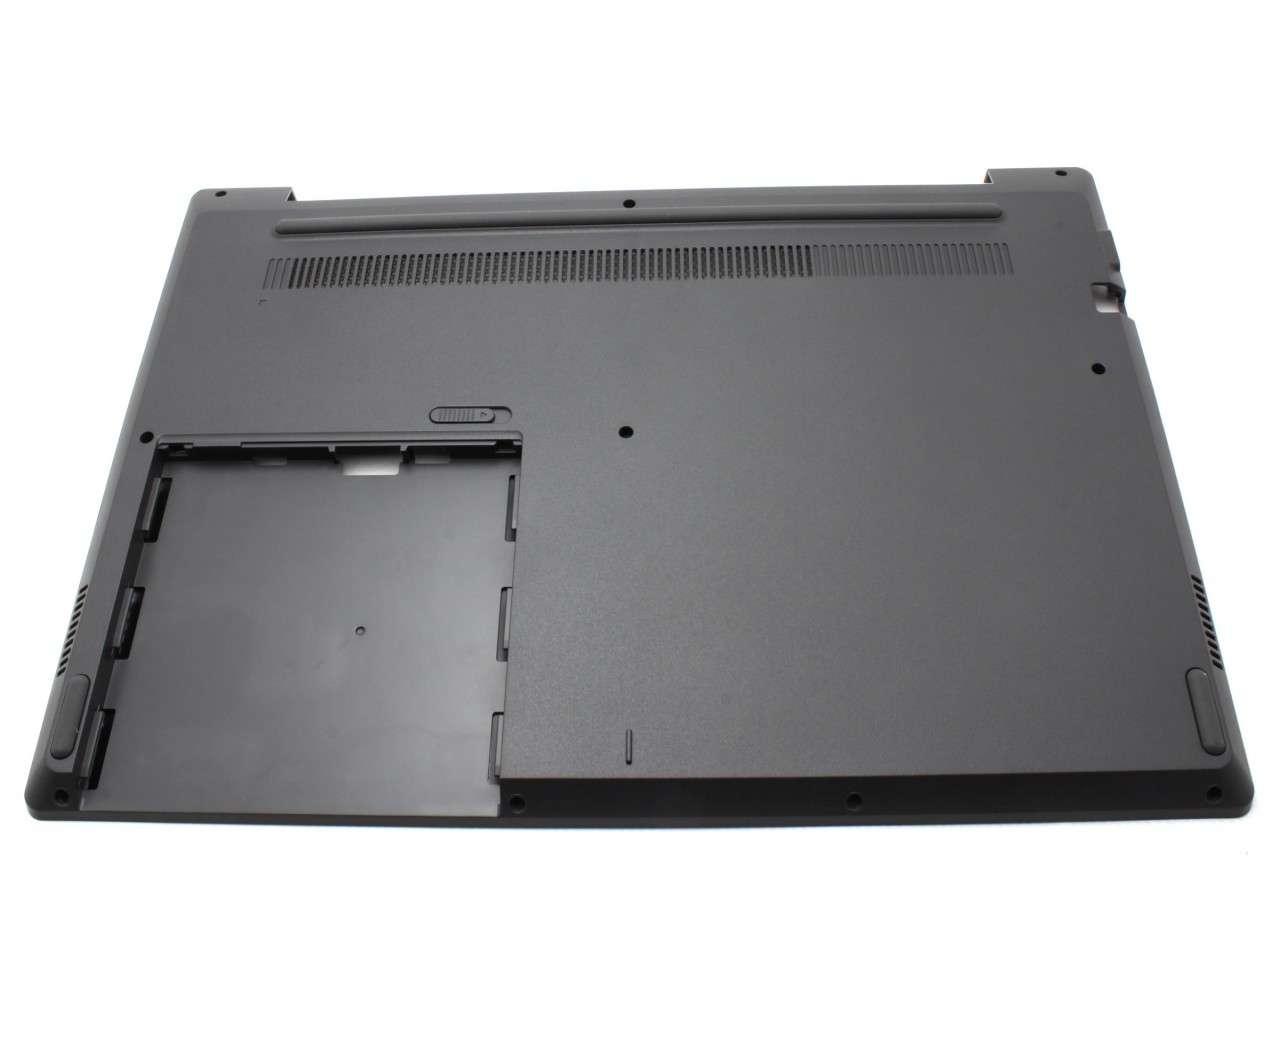 Bottom Case Lenovo 81B0003KAU Carcasa Inferioara Neagra cu Orificiu VGA imagine powerlaptop.ro 2021